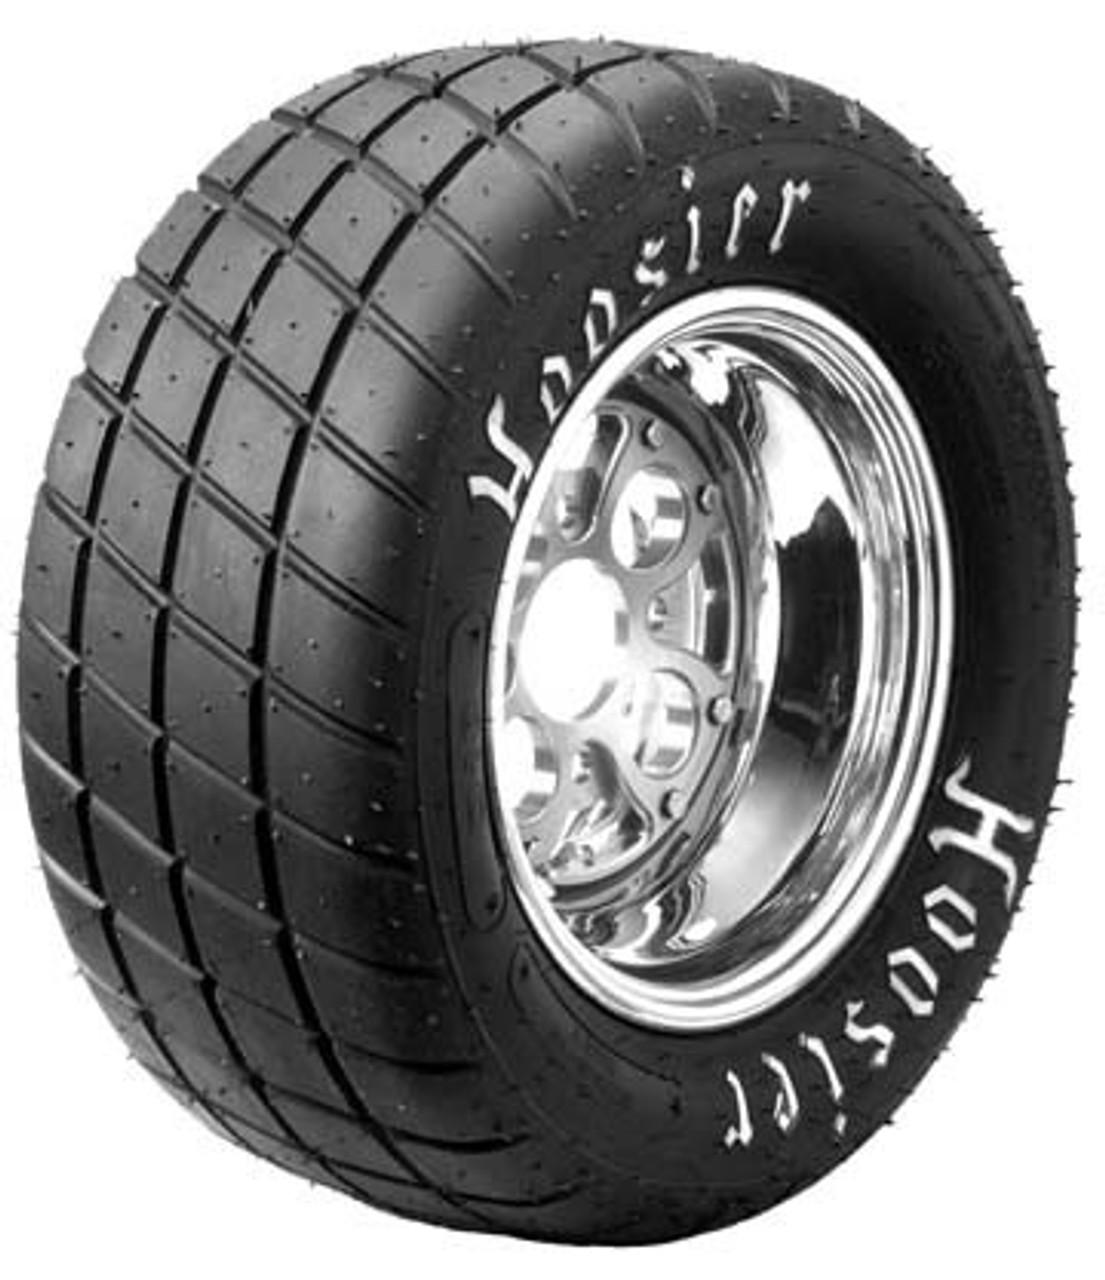 Hoosier Mini Sprint Dirt Tire